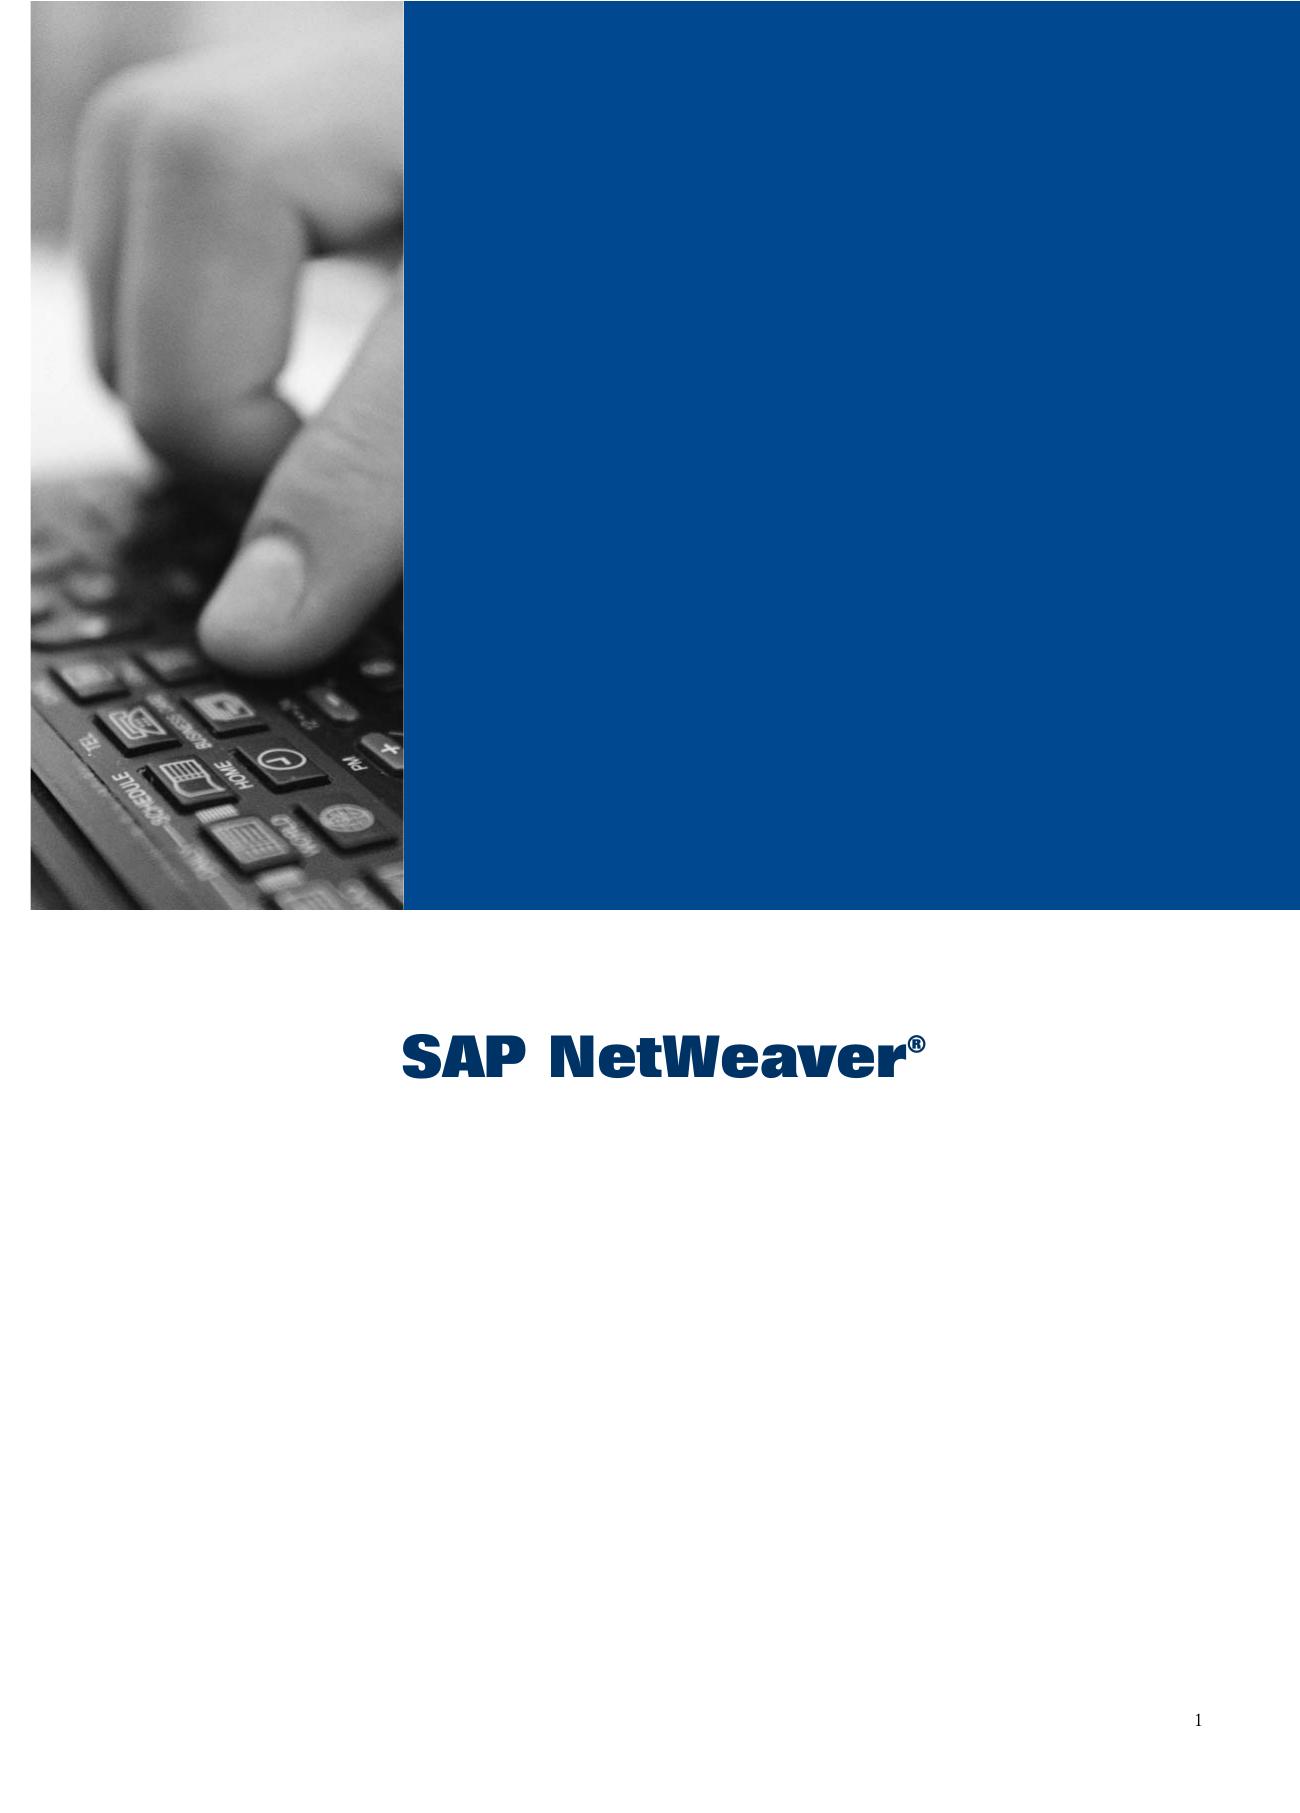 SAP NetWeaver - SAP Service Marketplace